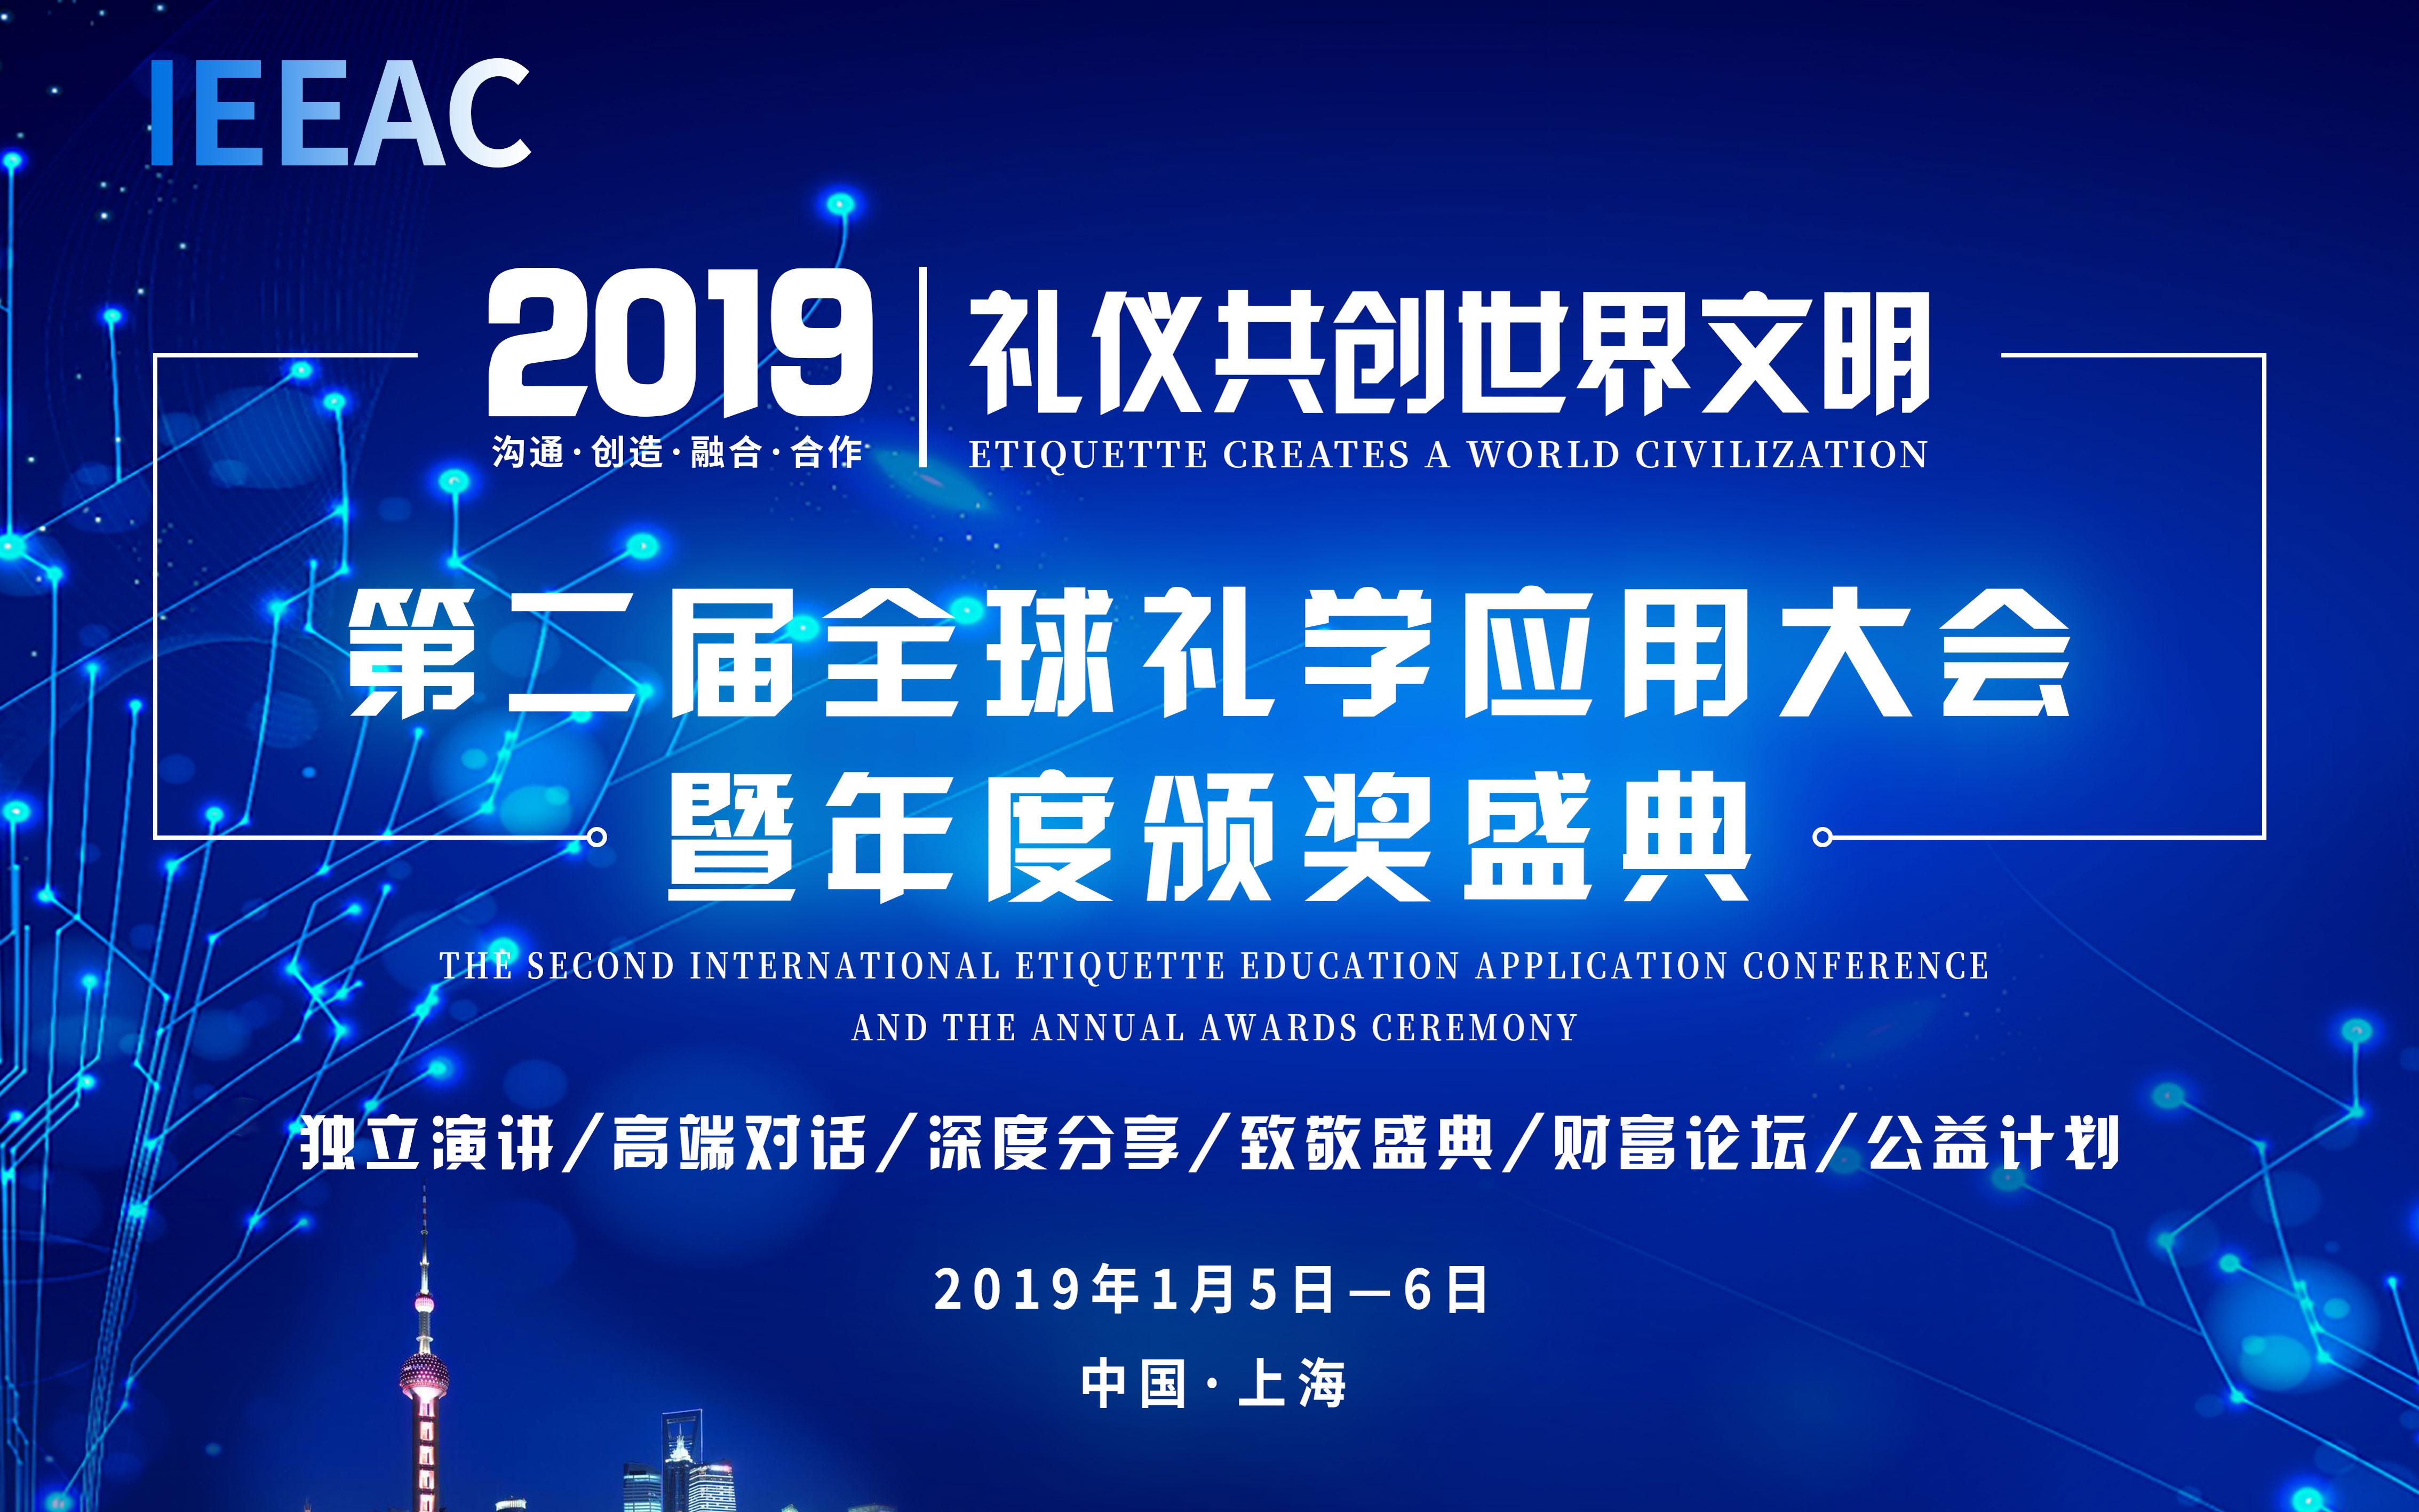 IEEAC 2019全球礼学应用大会(上海)